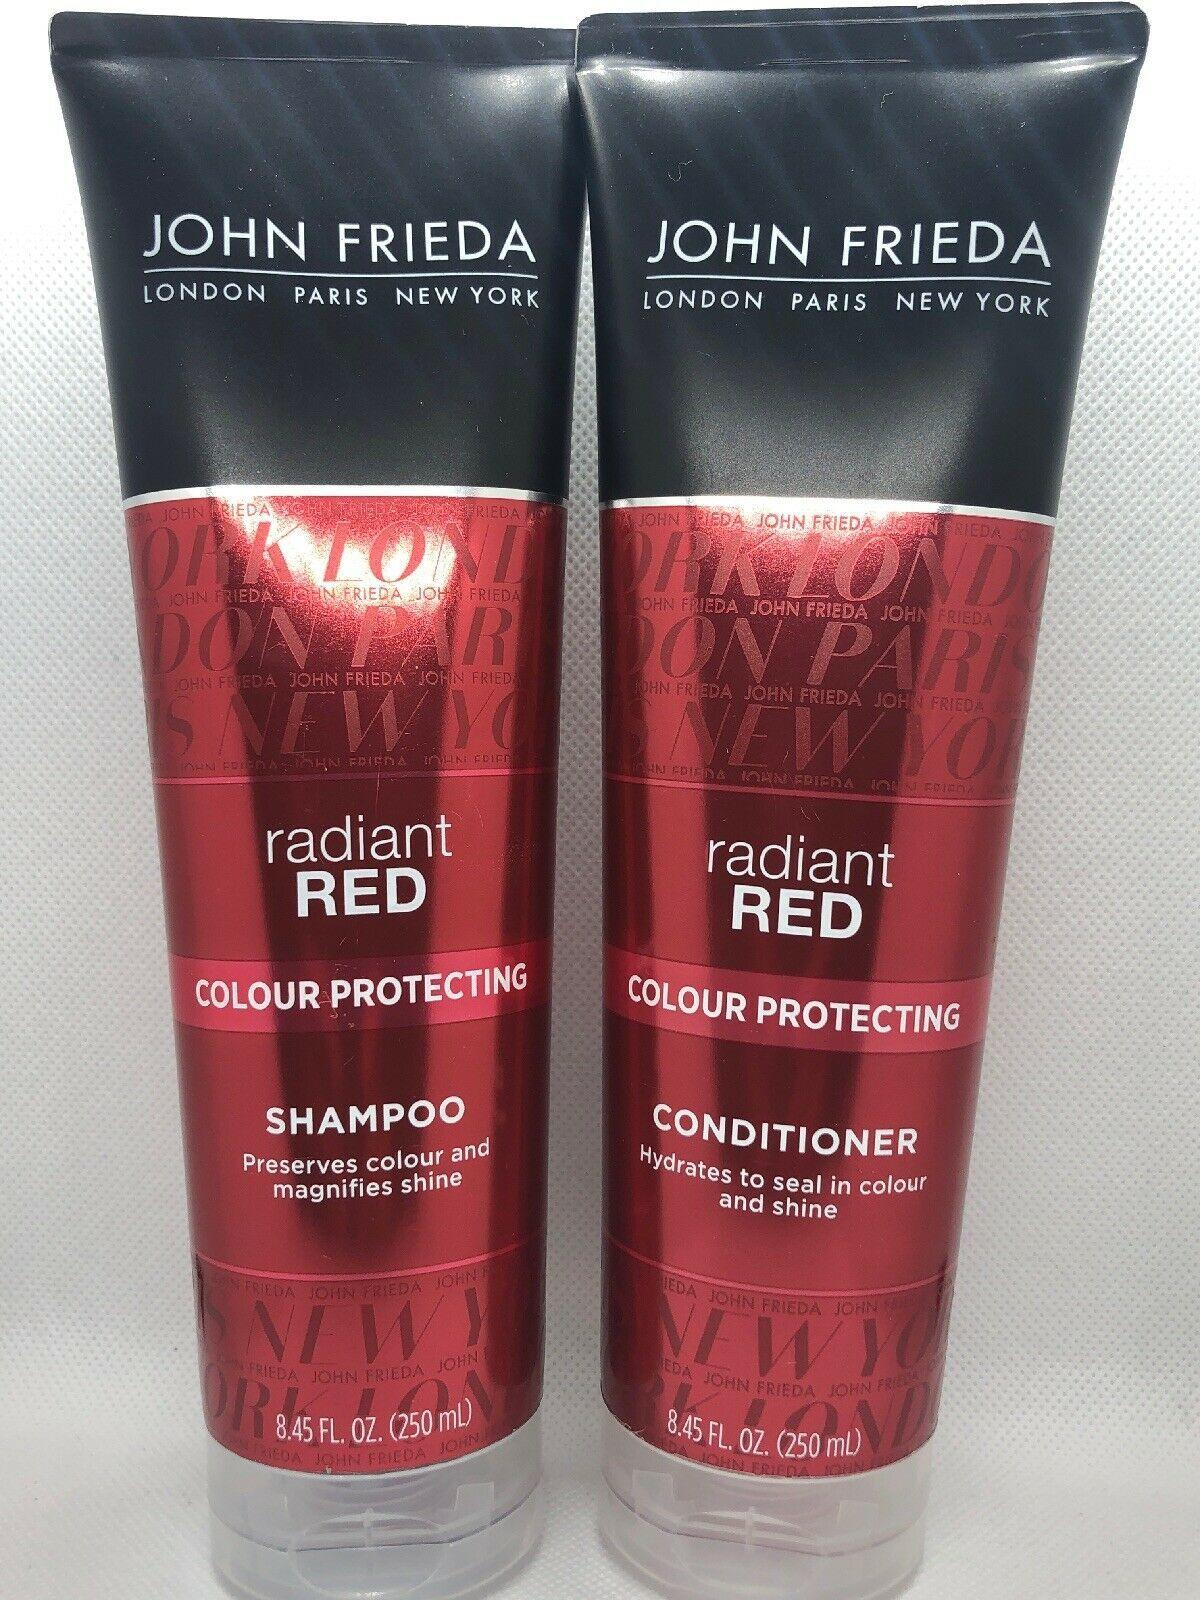 John Frieda Radiant Red Colour Protecting Shampoo & Conditioner Set 8.45 fl oz - $27.00